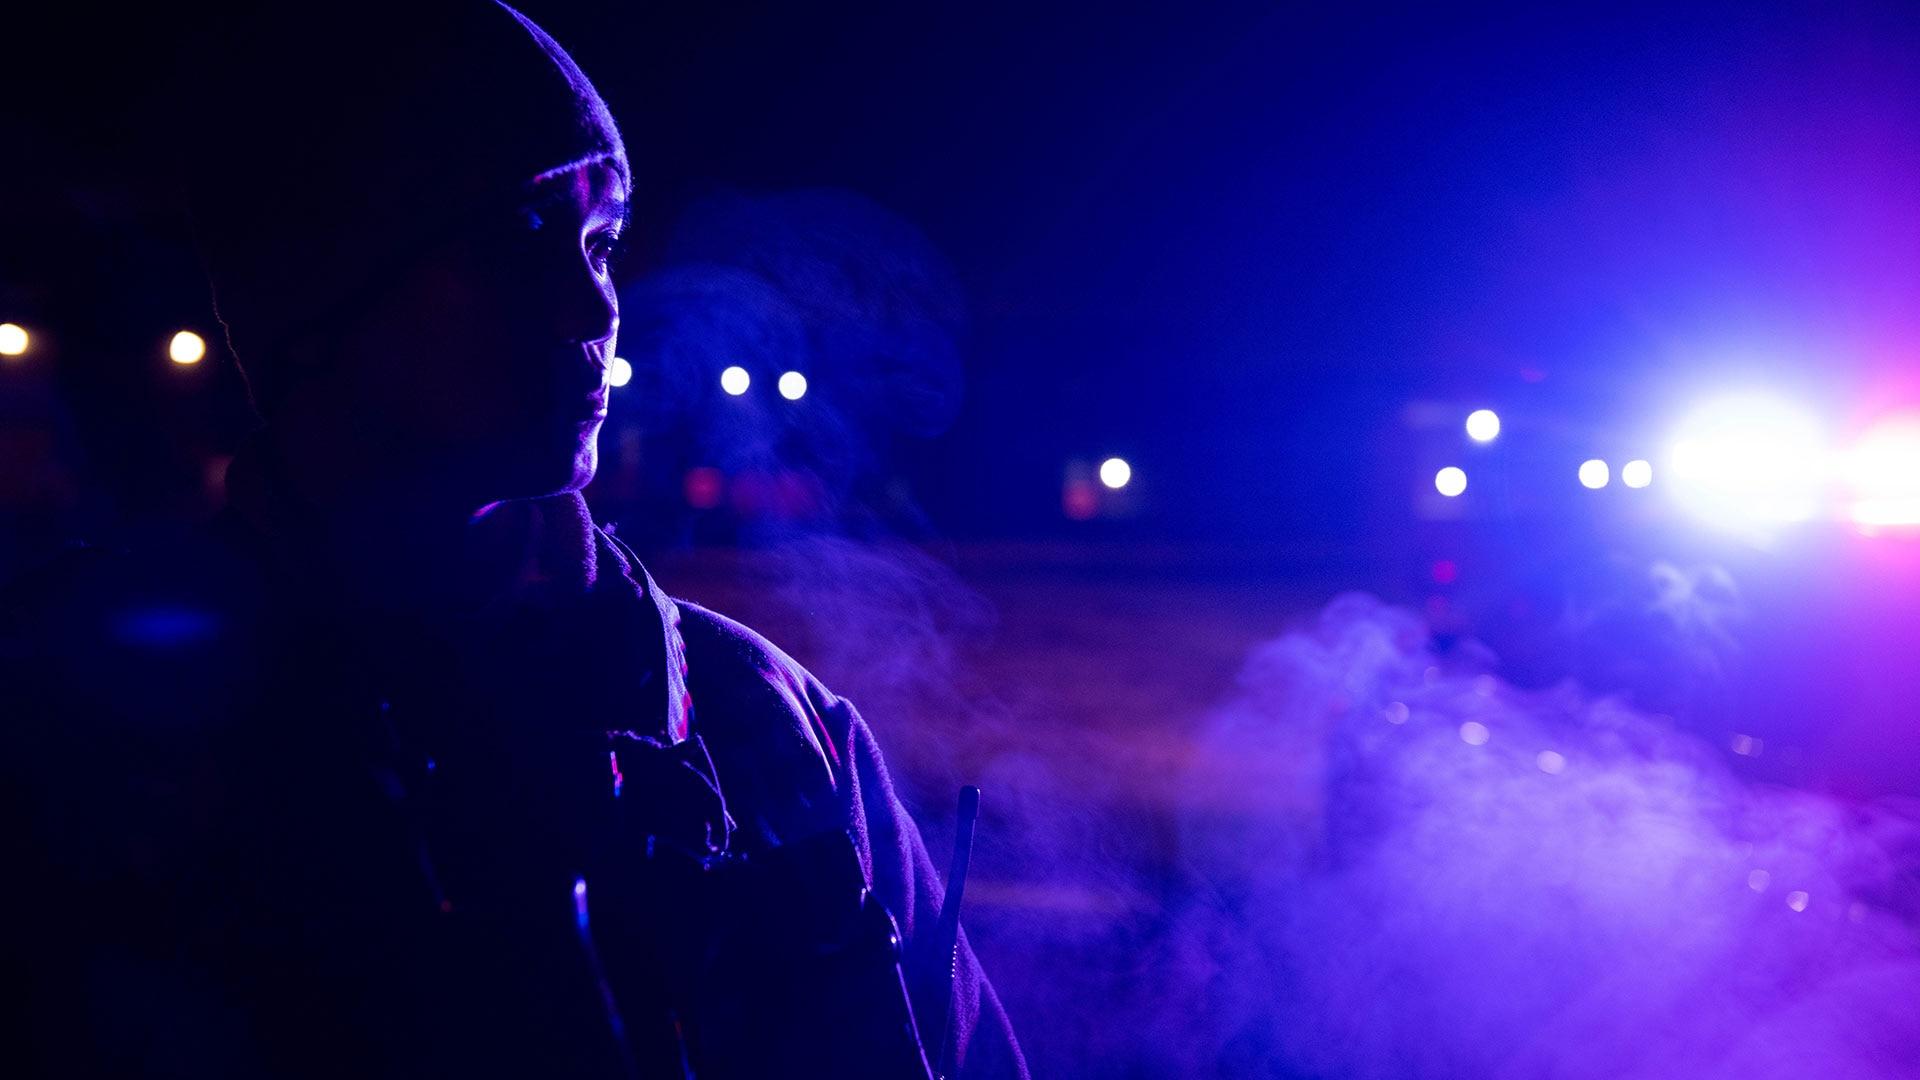 Senior Airman Gabriel Rubina, 375th Security Forces Squadron defender, patrols the base during a night shift at Scott Air Force Base, Ill., Jan. 30, 2020